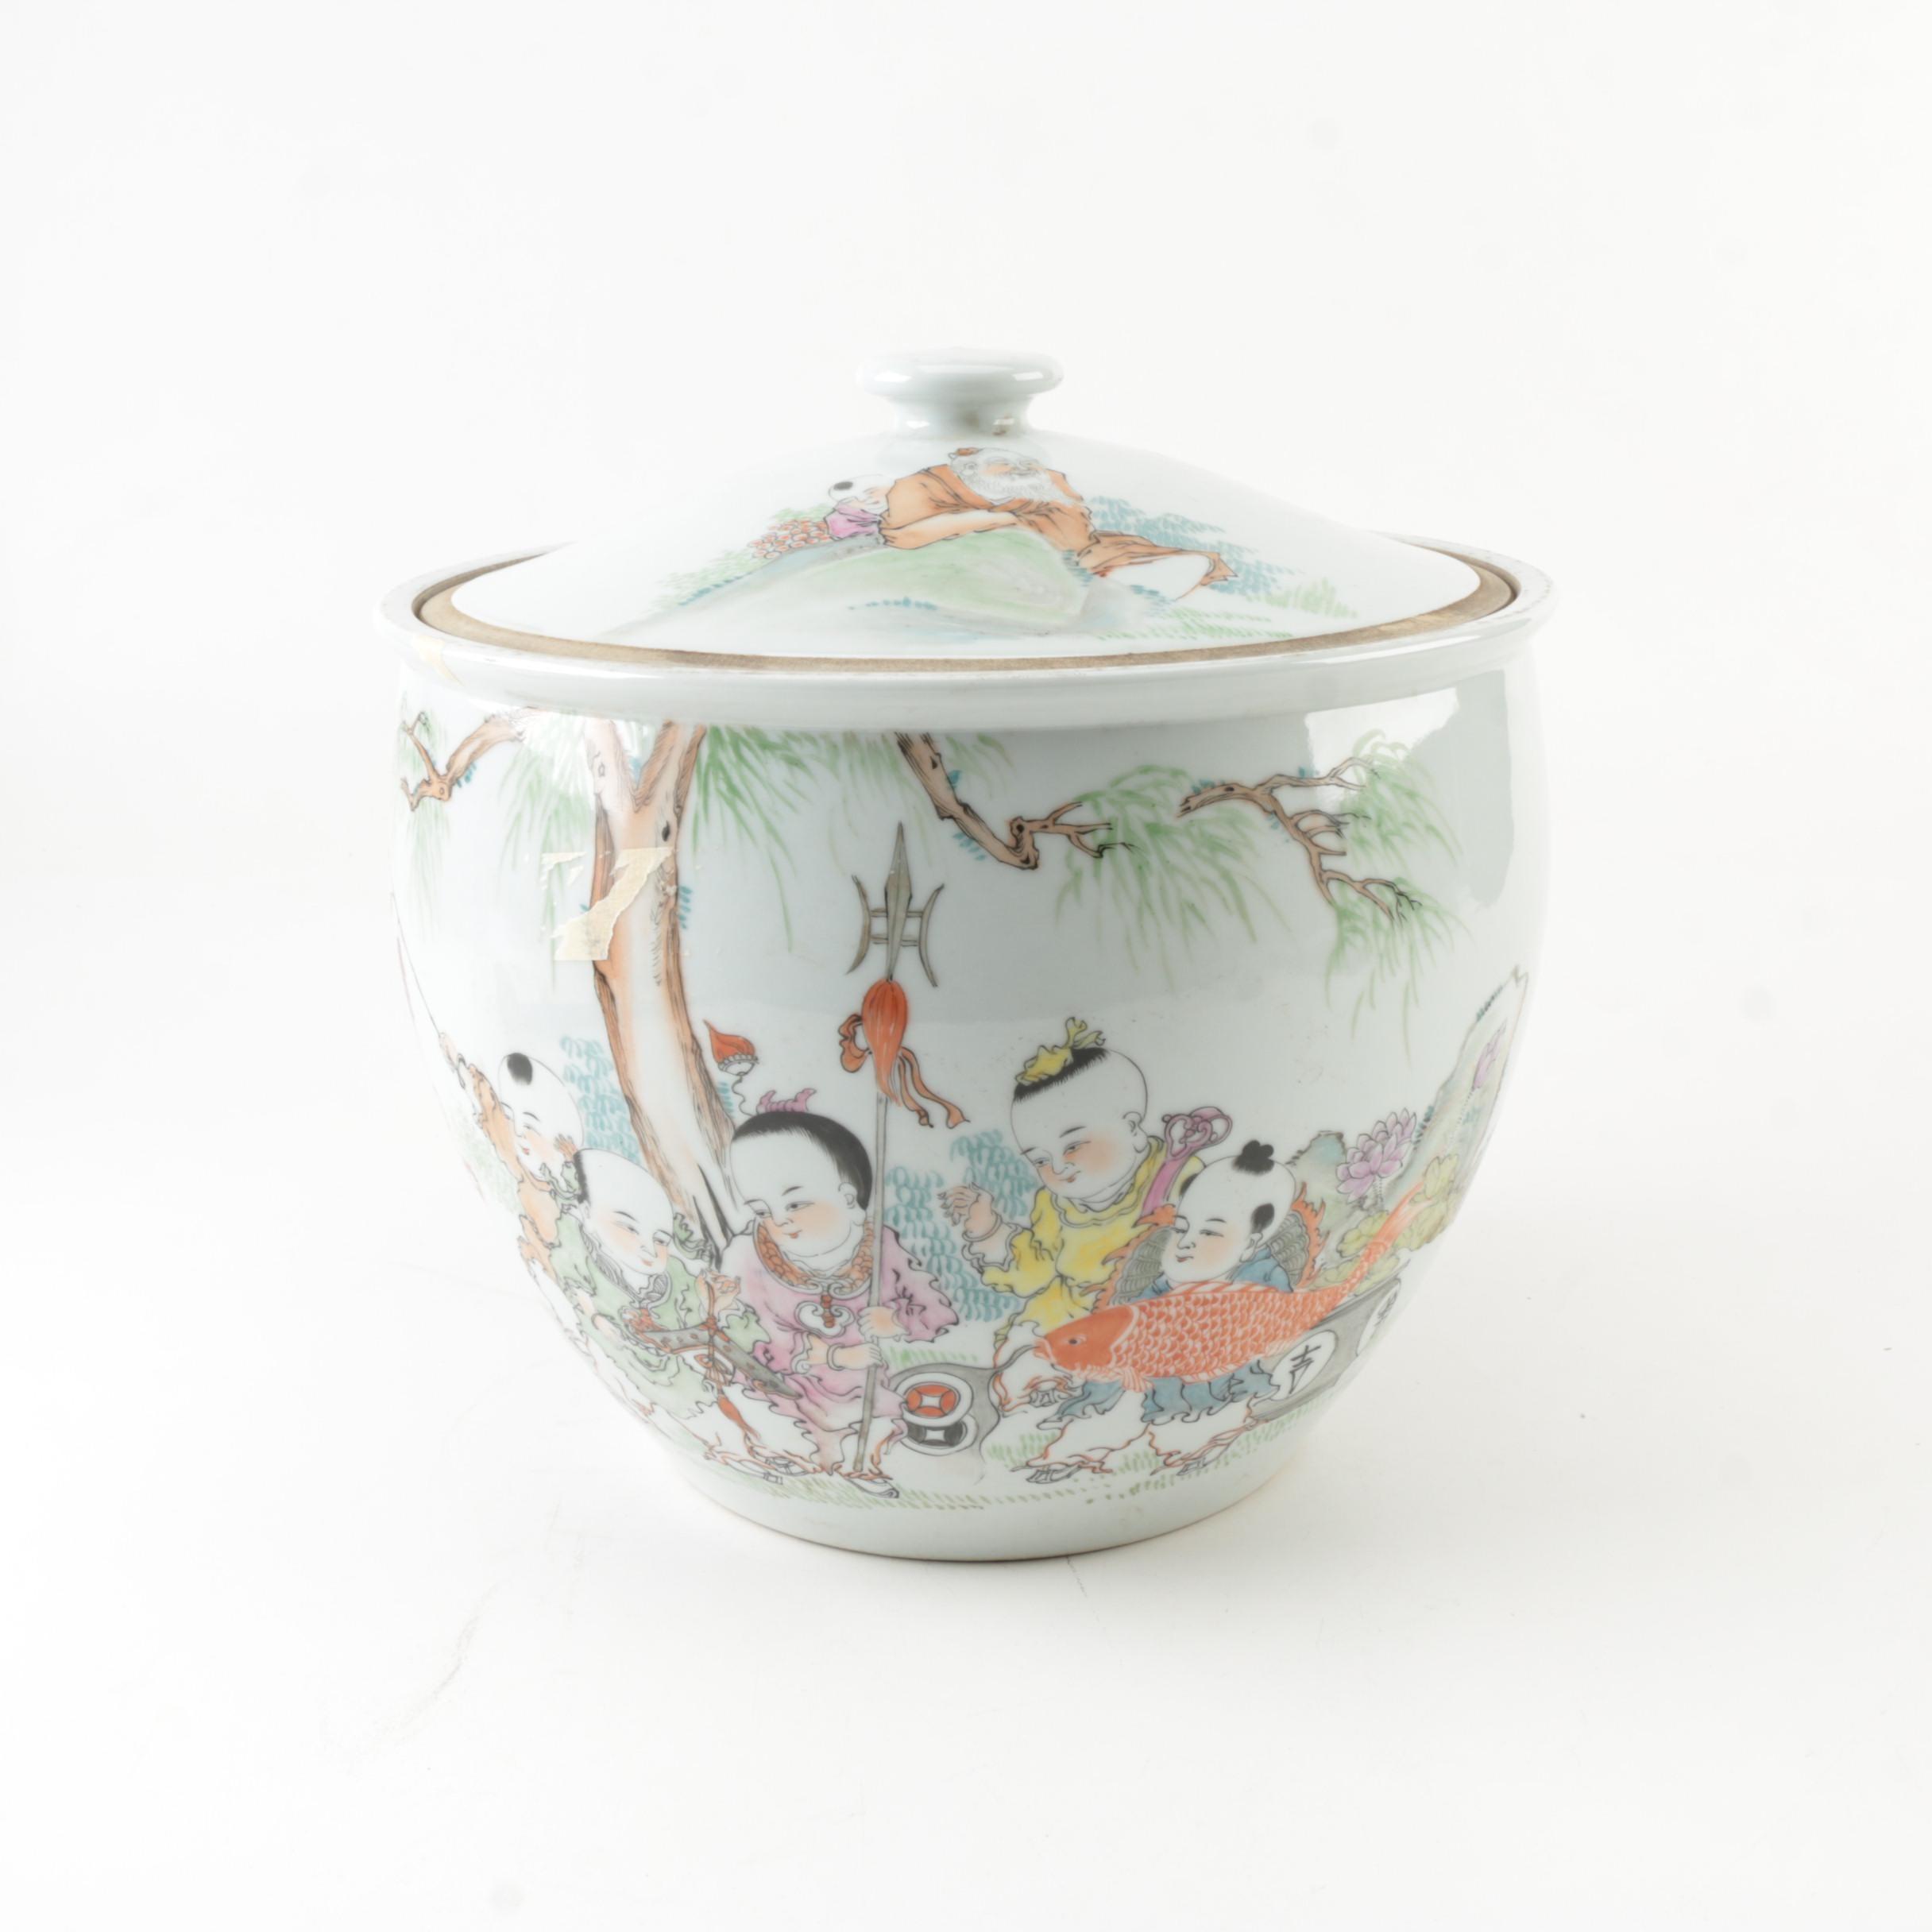 Chinese Porcelain Lidded Jar with Figural Motif